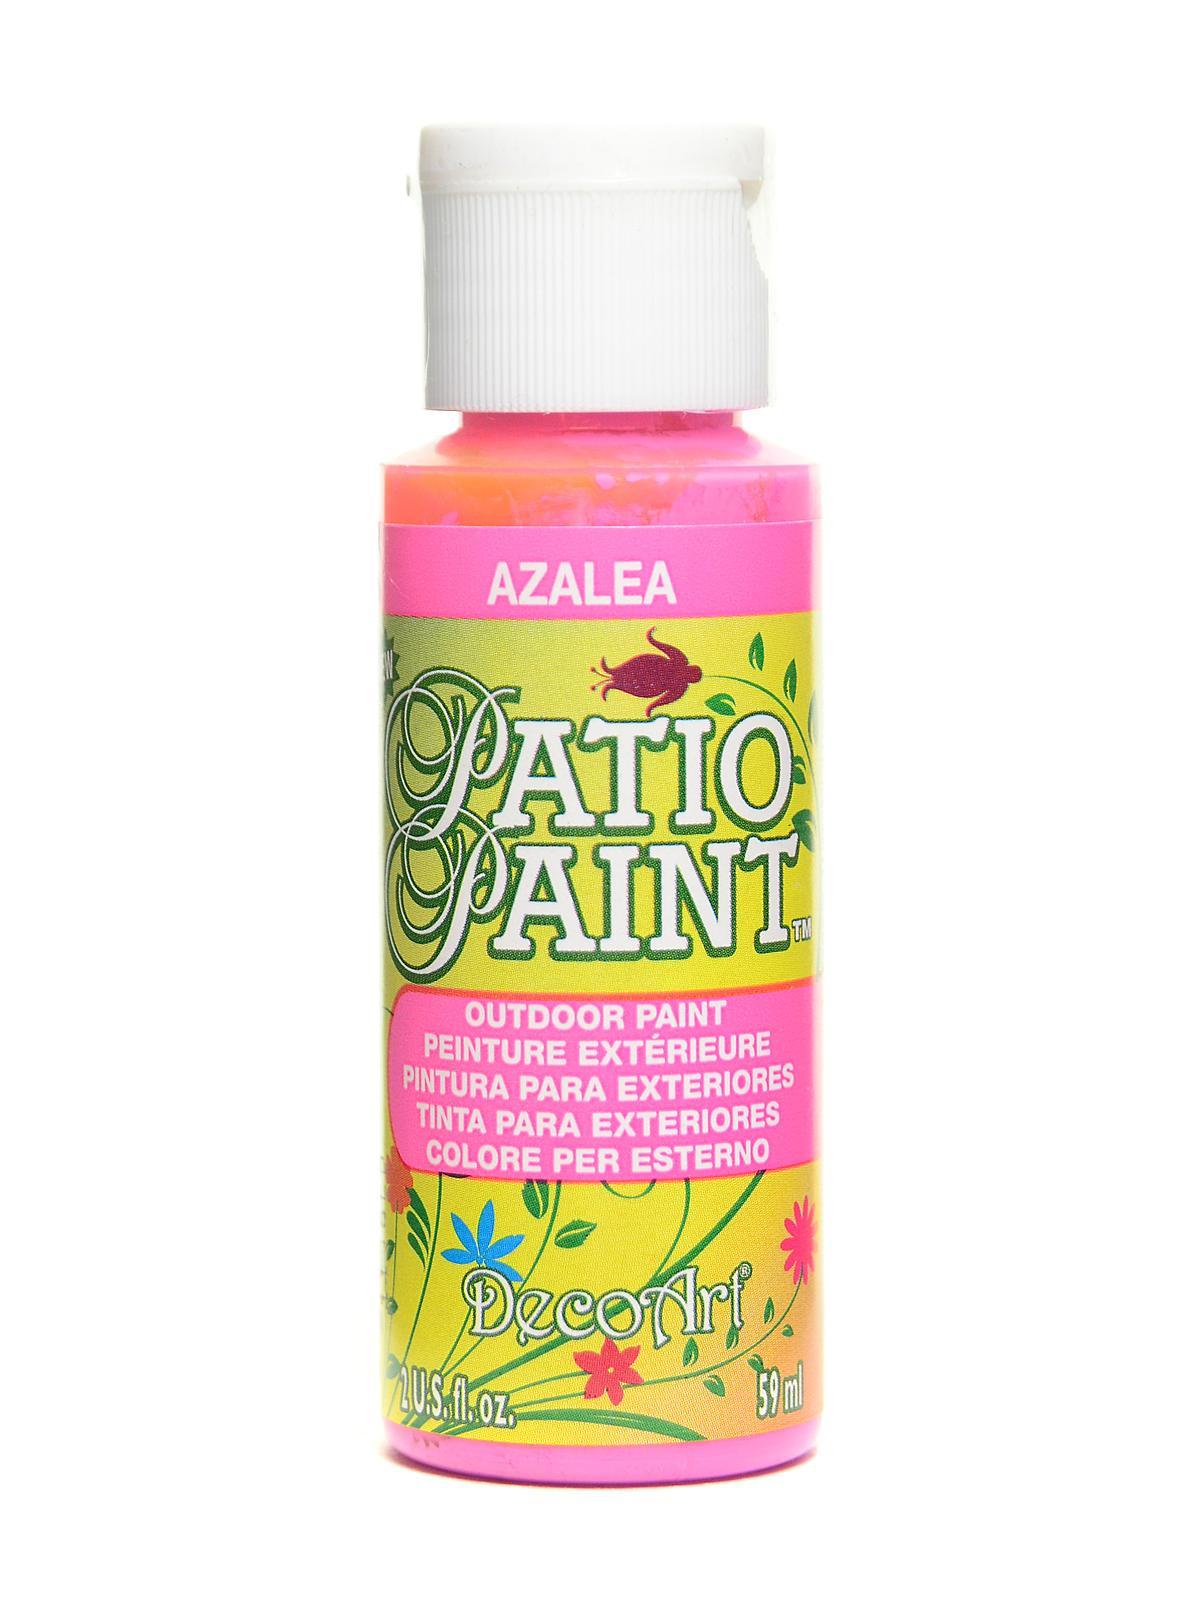 Patio Paint azalea 2 oz. - DecoArt Patio Paint MisterArt.com